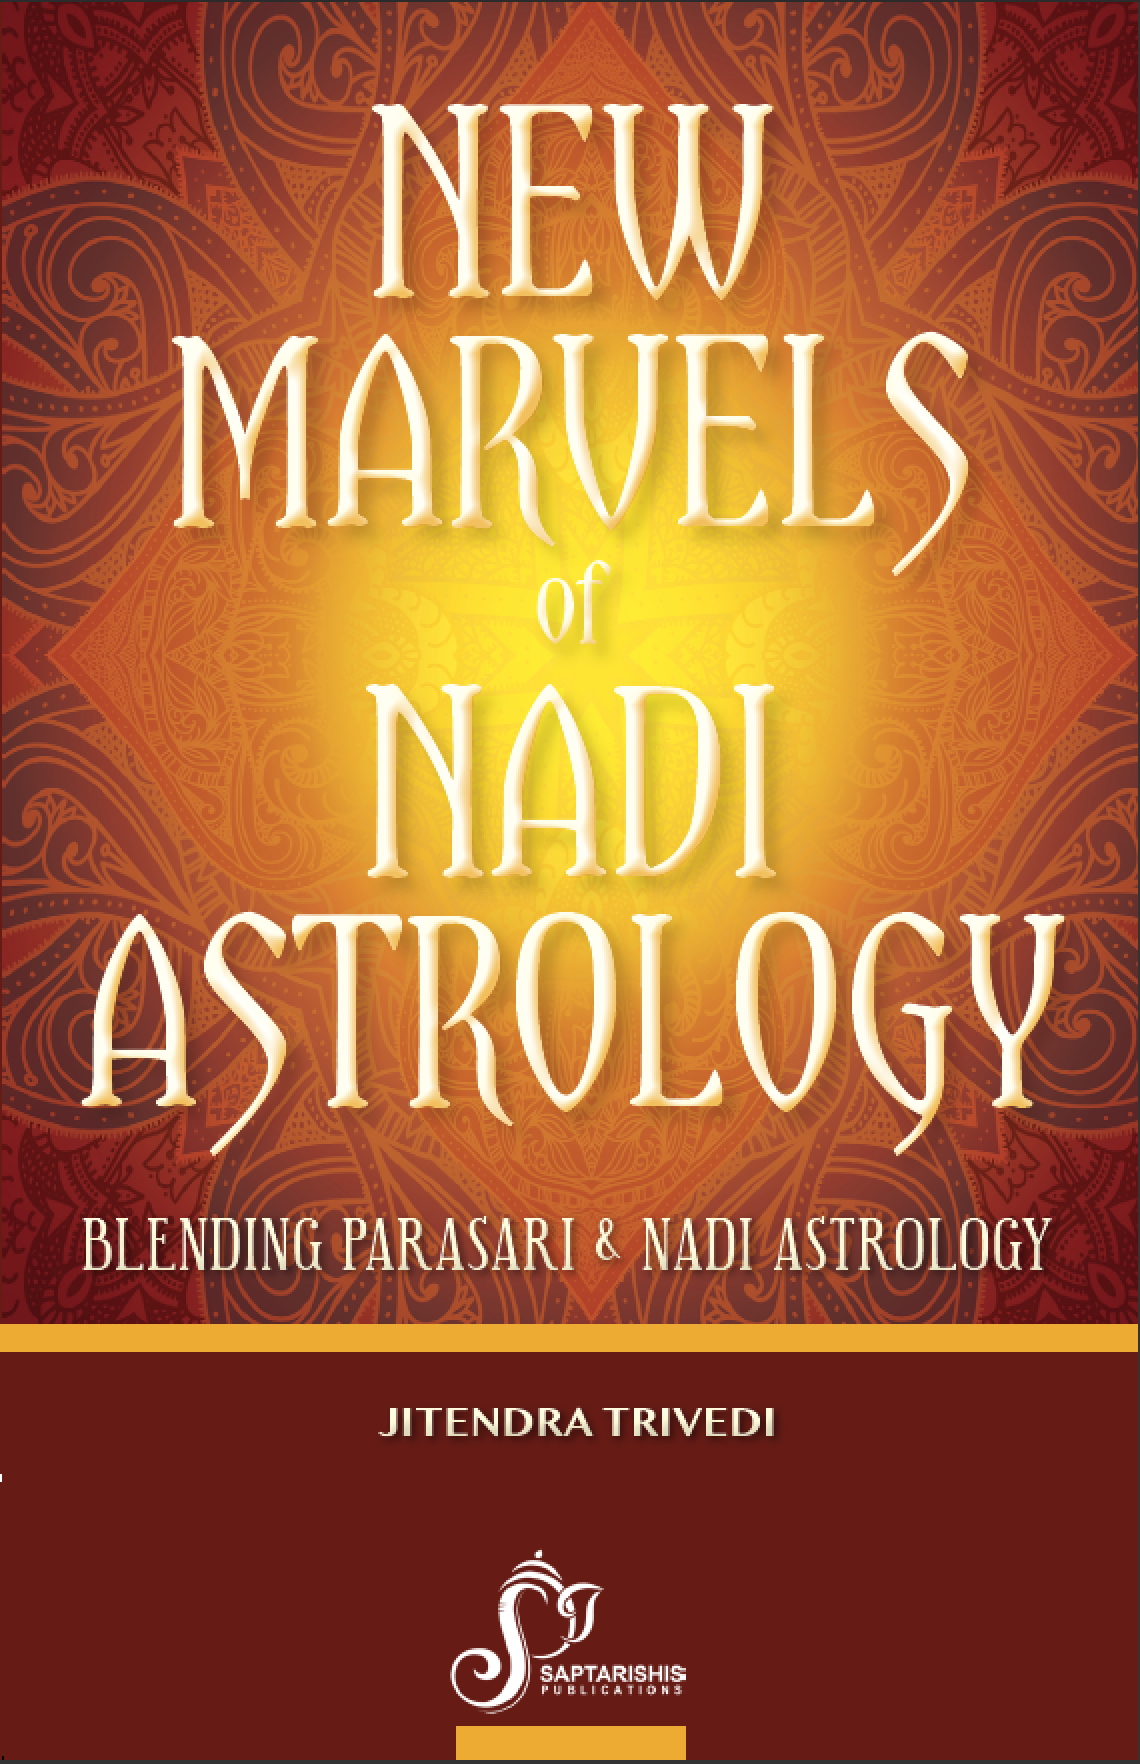 New Marvels Of Nadi Astrology By Jitendra Trivedi [SA]